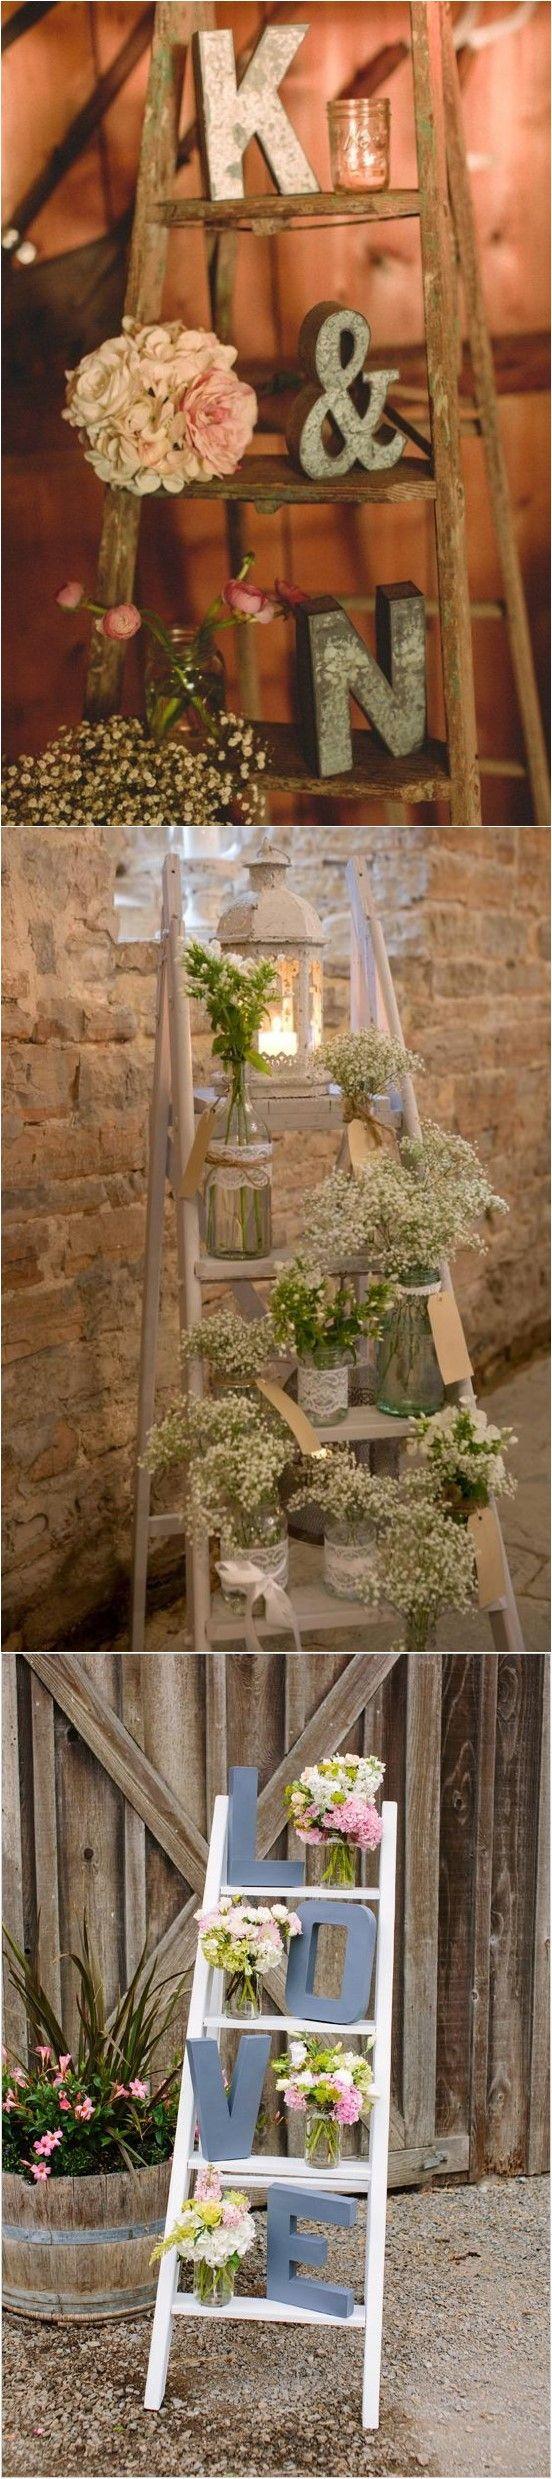 Wedding decorations wood november 2018  best OnCloudBreaux September   images on Pinterest